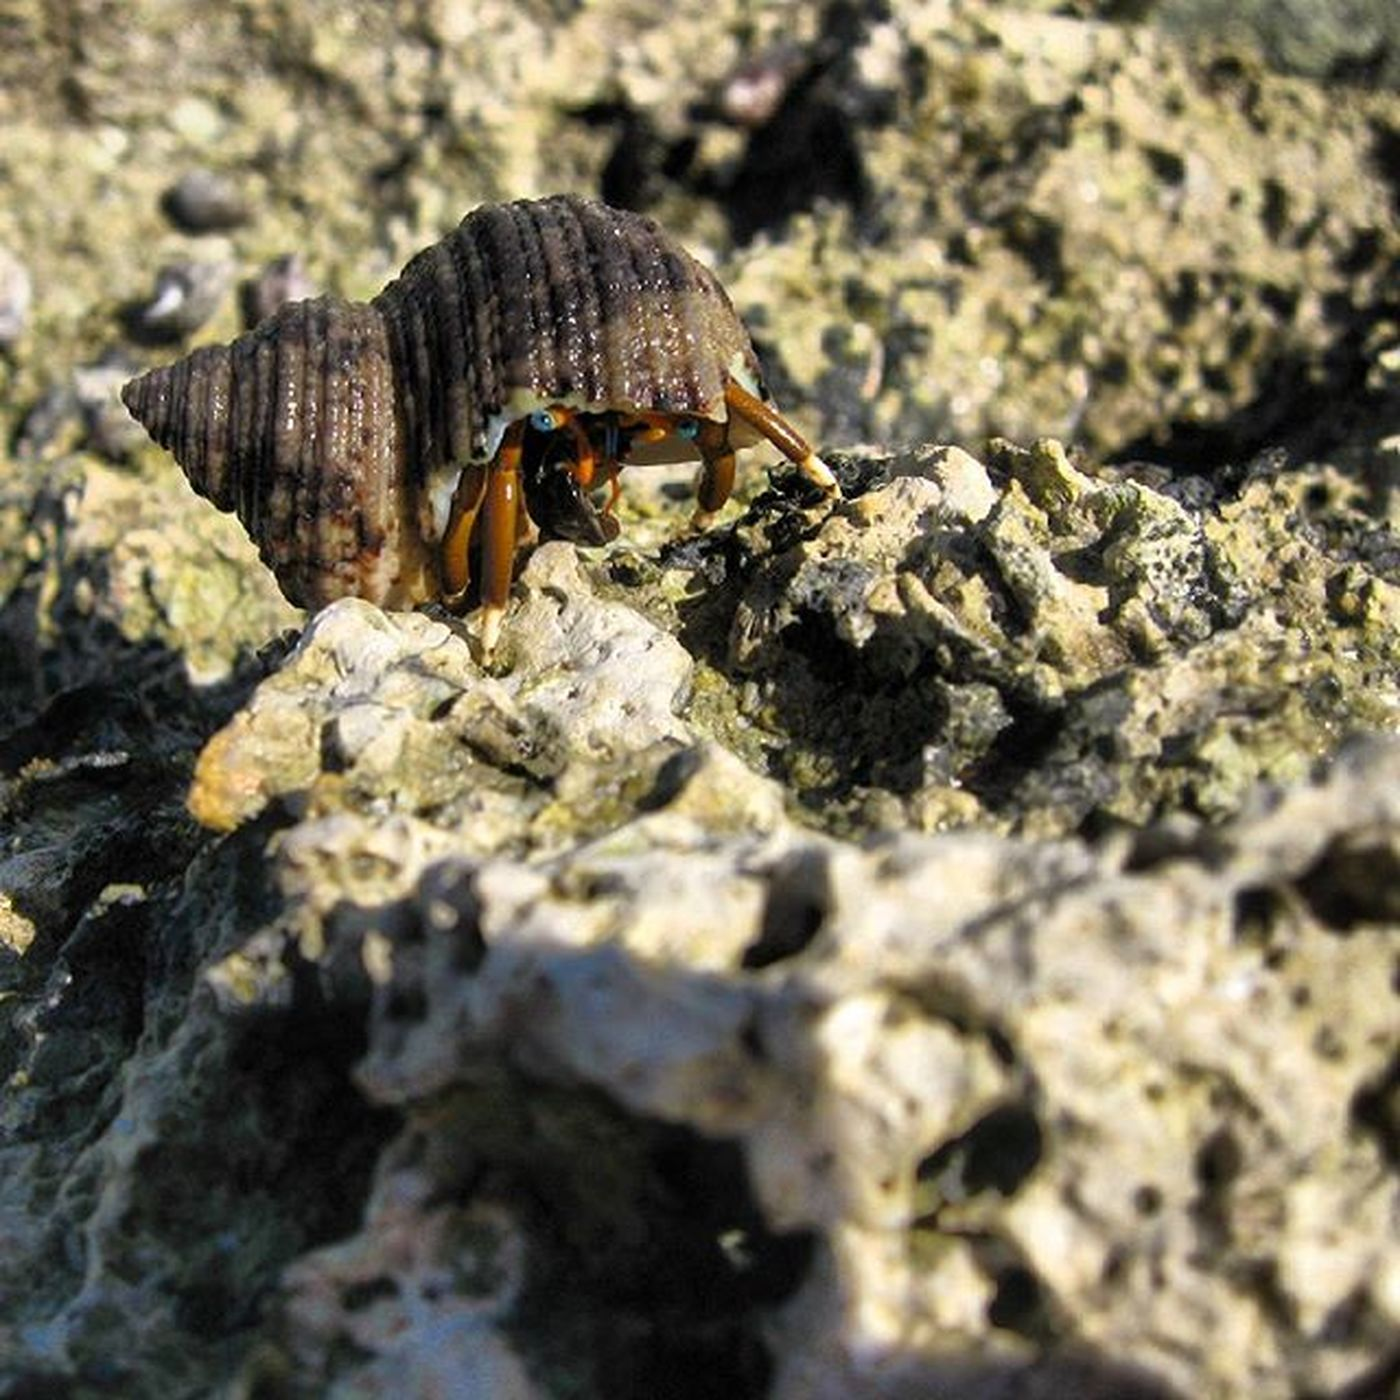 Hermit Crab - Calcinus laevimanus Hermitcrab Anomura Kelomang Ambon Ambonmanise INDONESIA Insta Instapic Biodiversity